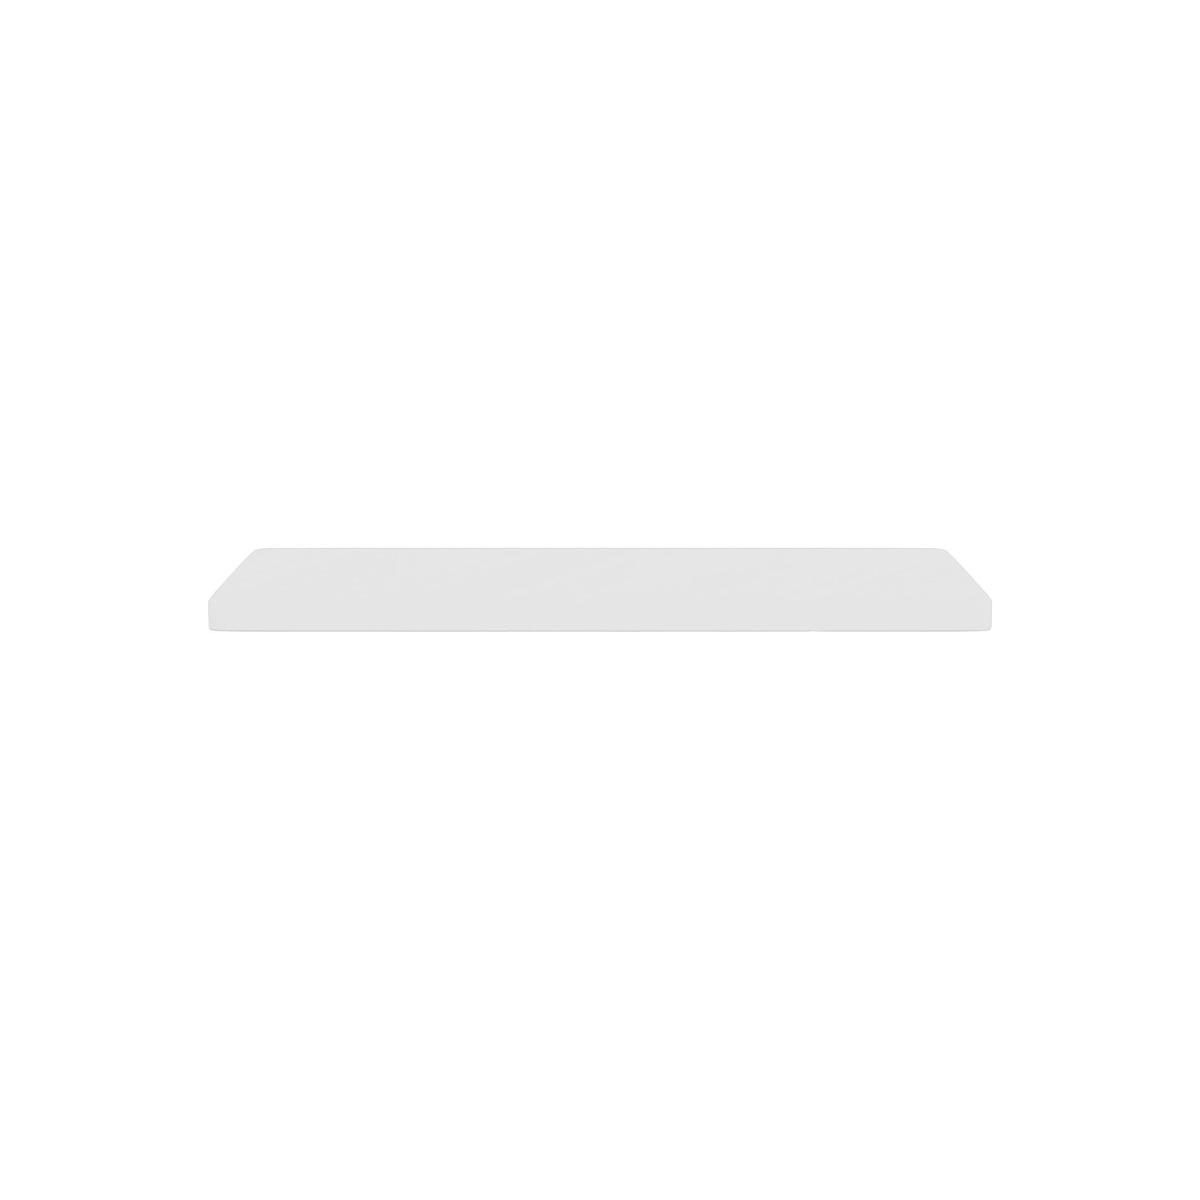 Montana Toppskiva Wire 34,8x18,8cm New White